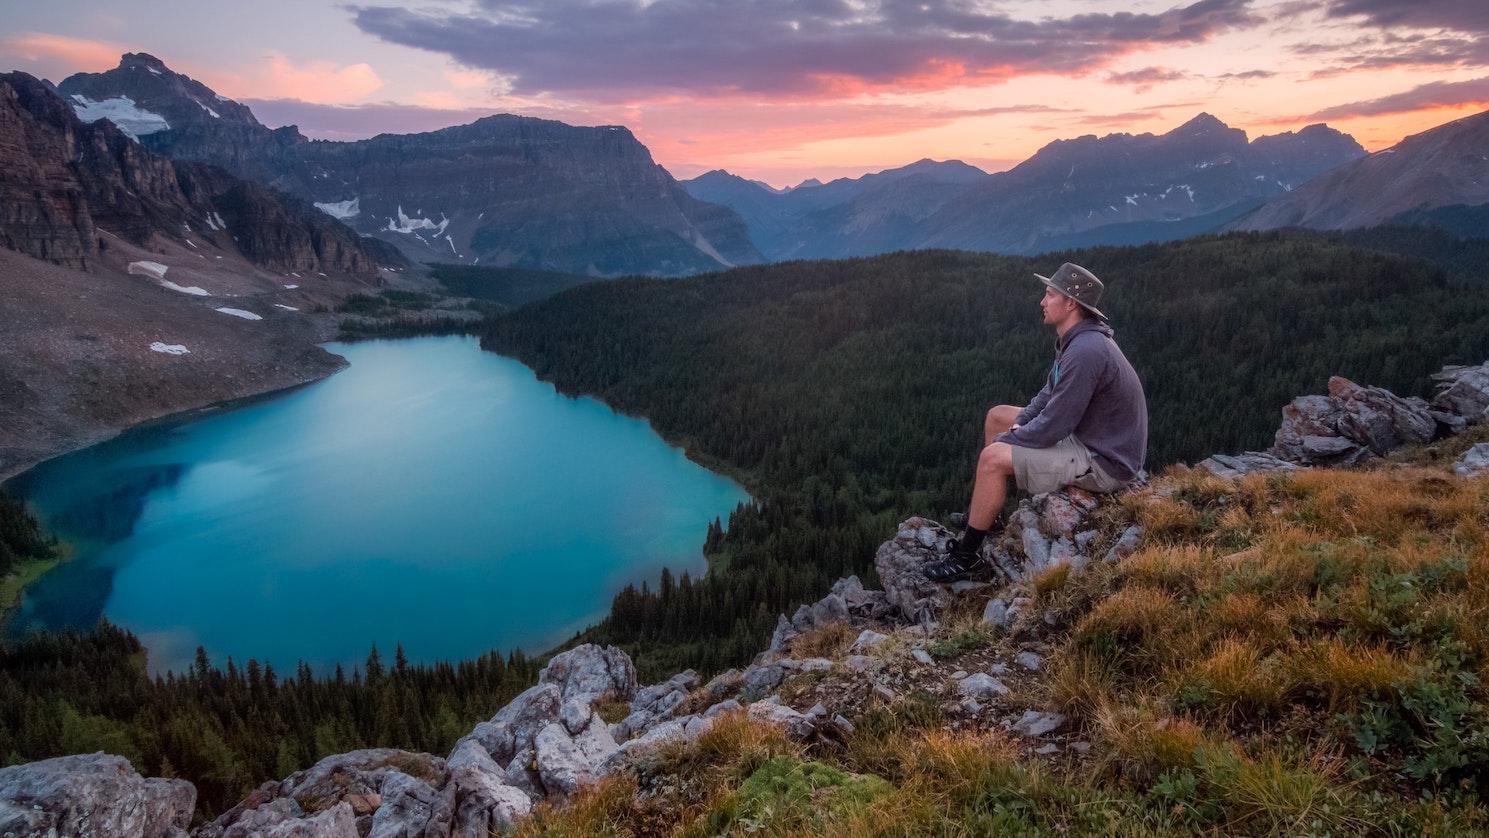 3 Road Trip Movies That Showcase Amazing Views of Canada